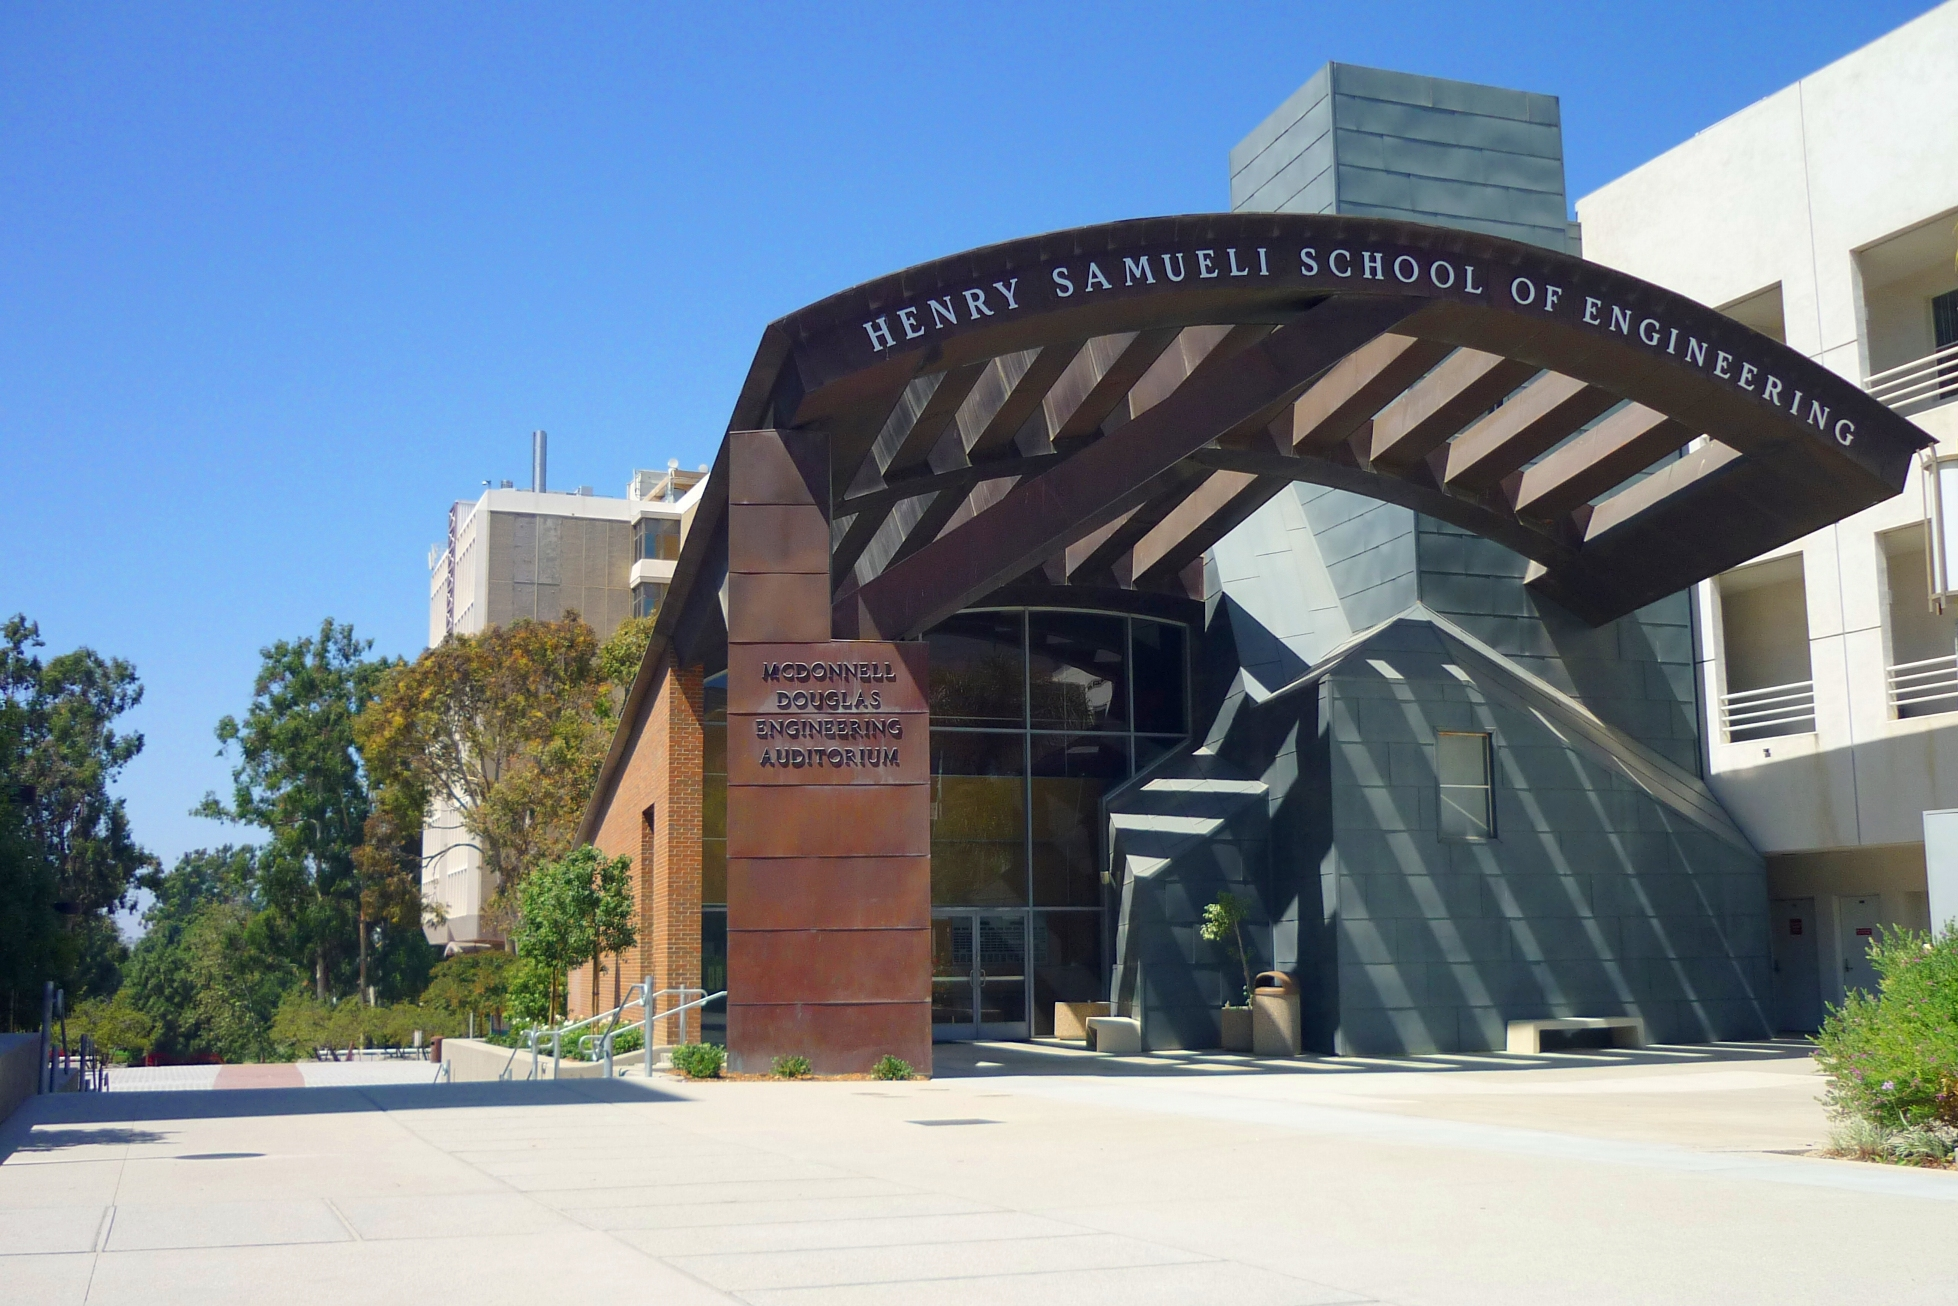 File:UC Irvine, School of Engineering.JPG - Wikimedia Commons